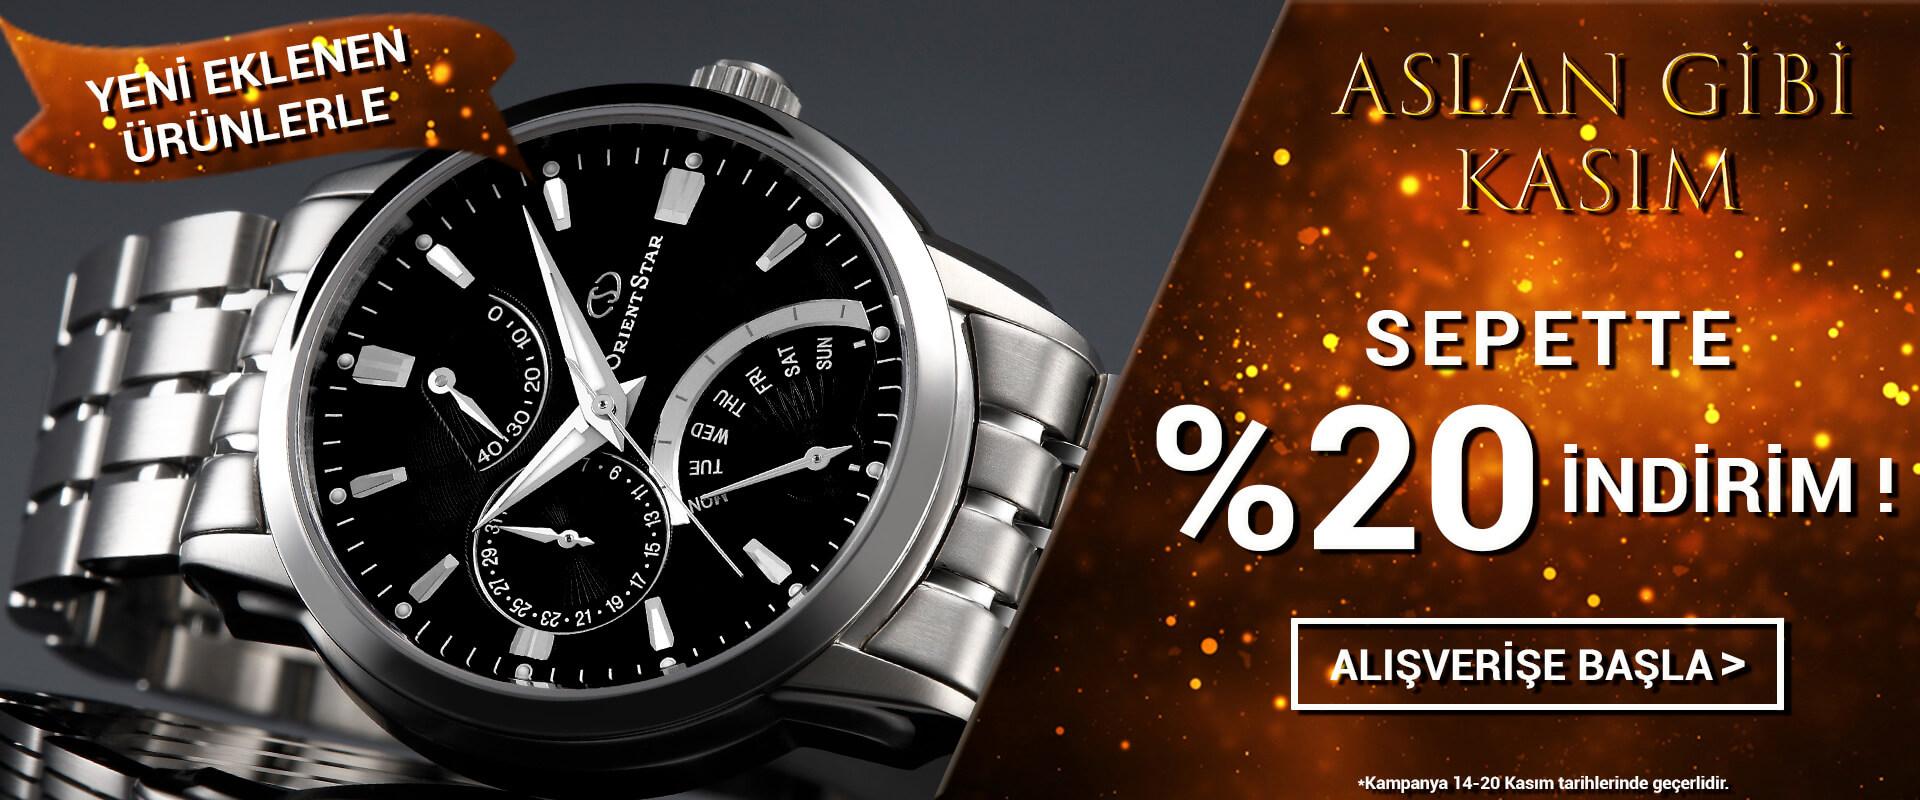 Aslan Gibi Kasım Orient Star Saat Sepette %15 İndirim